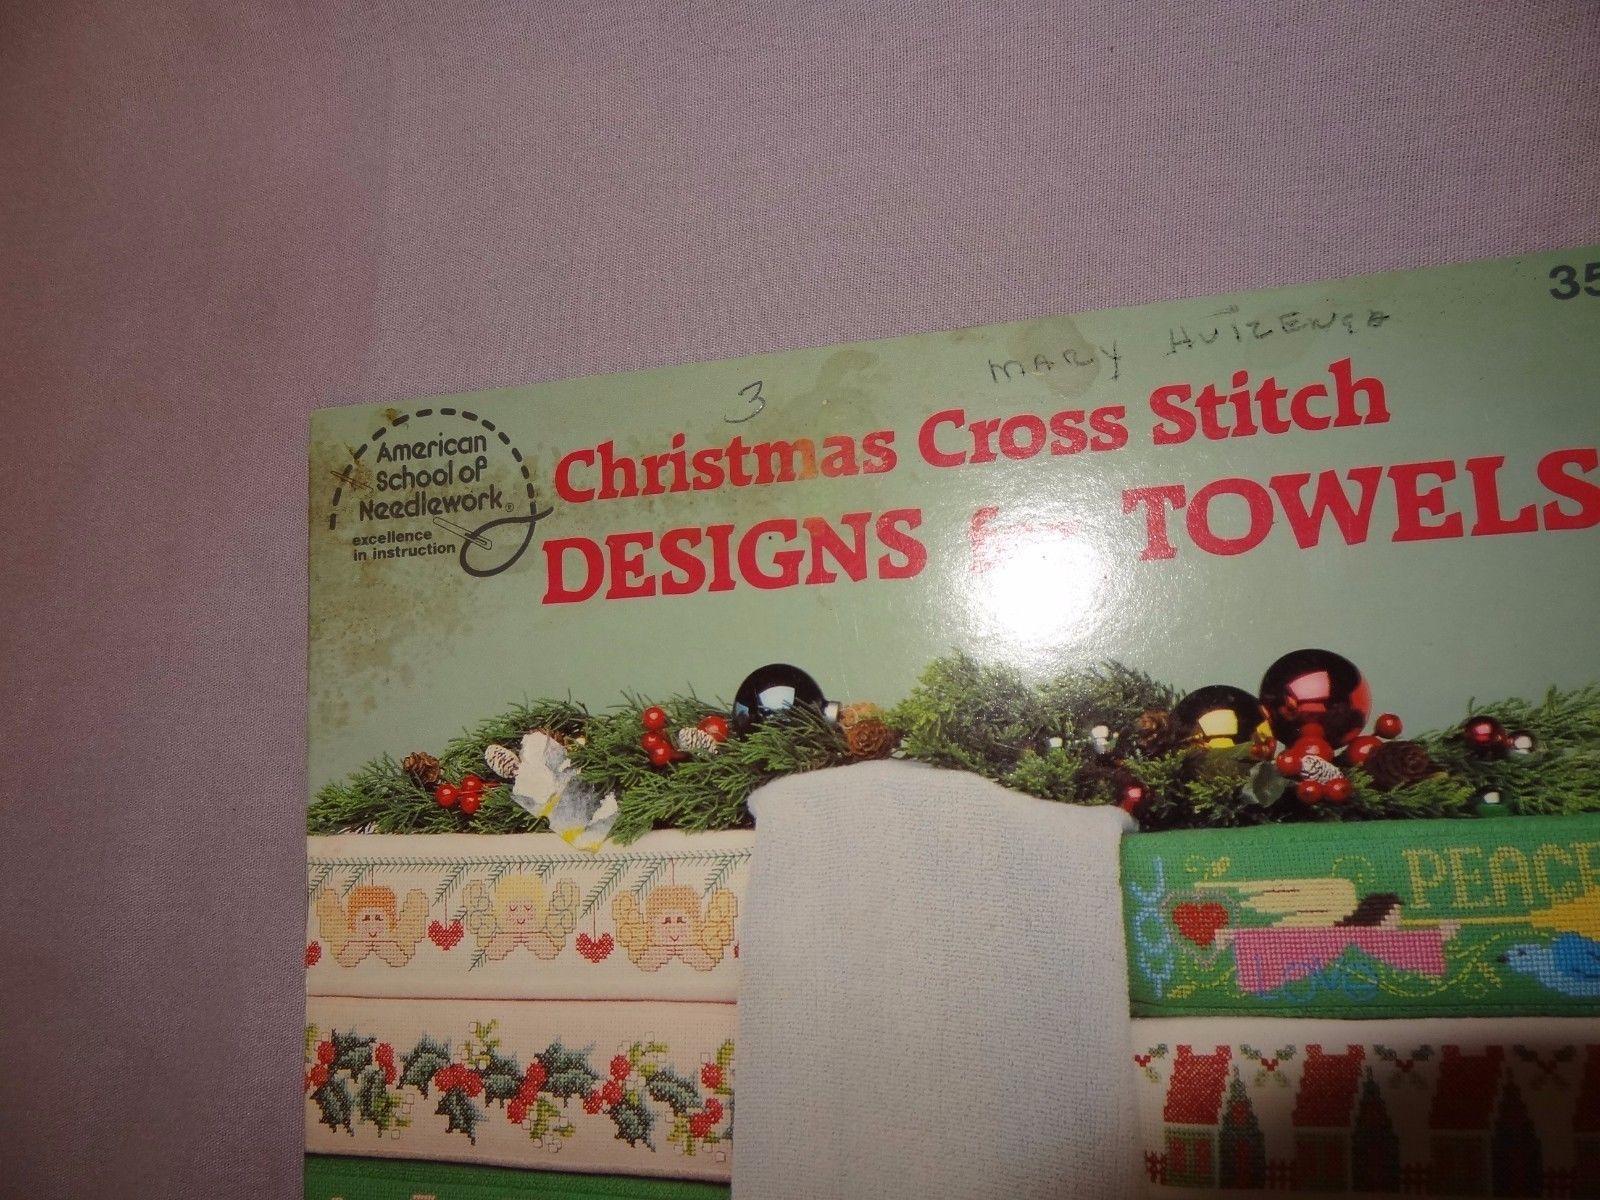 Christmas Cross Stitch Designs Towels Cross Stitch 1987 Pattern Booklet 3506